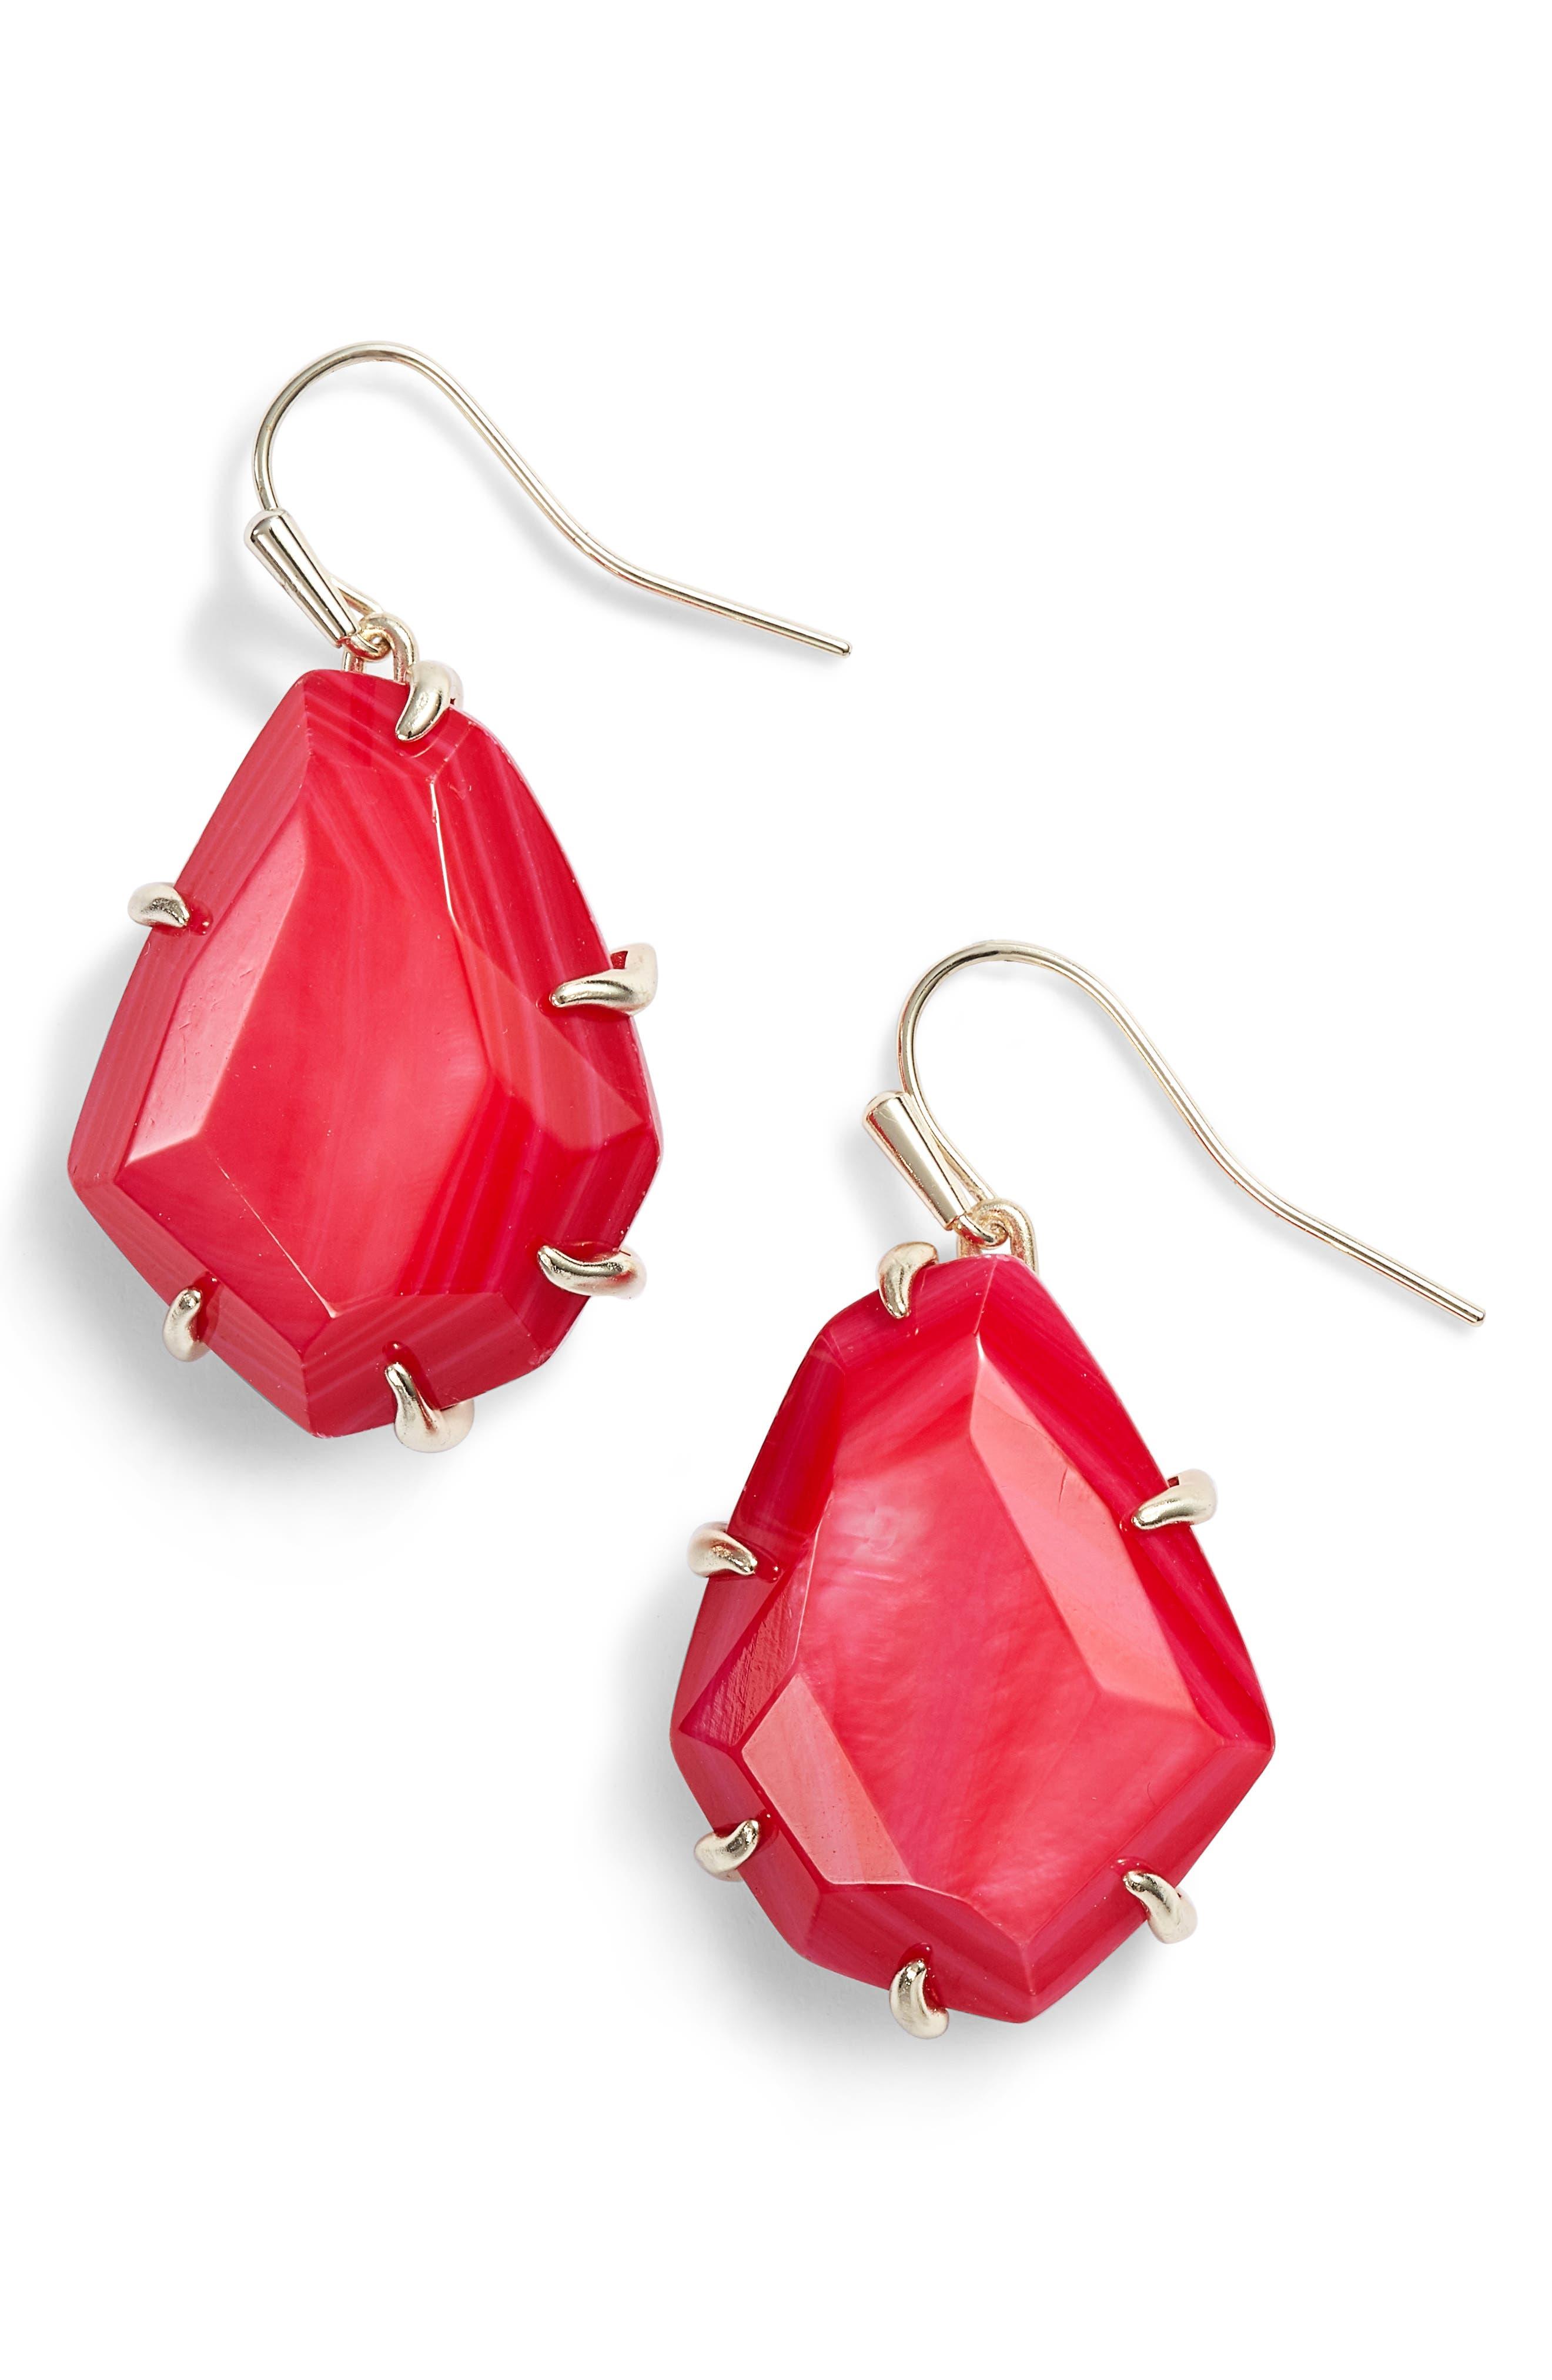 Kendra Scott Rosenell Stone Earrings